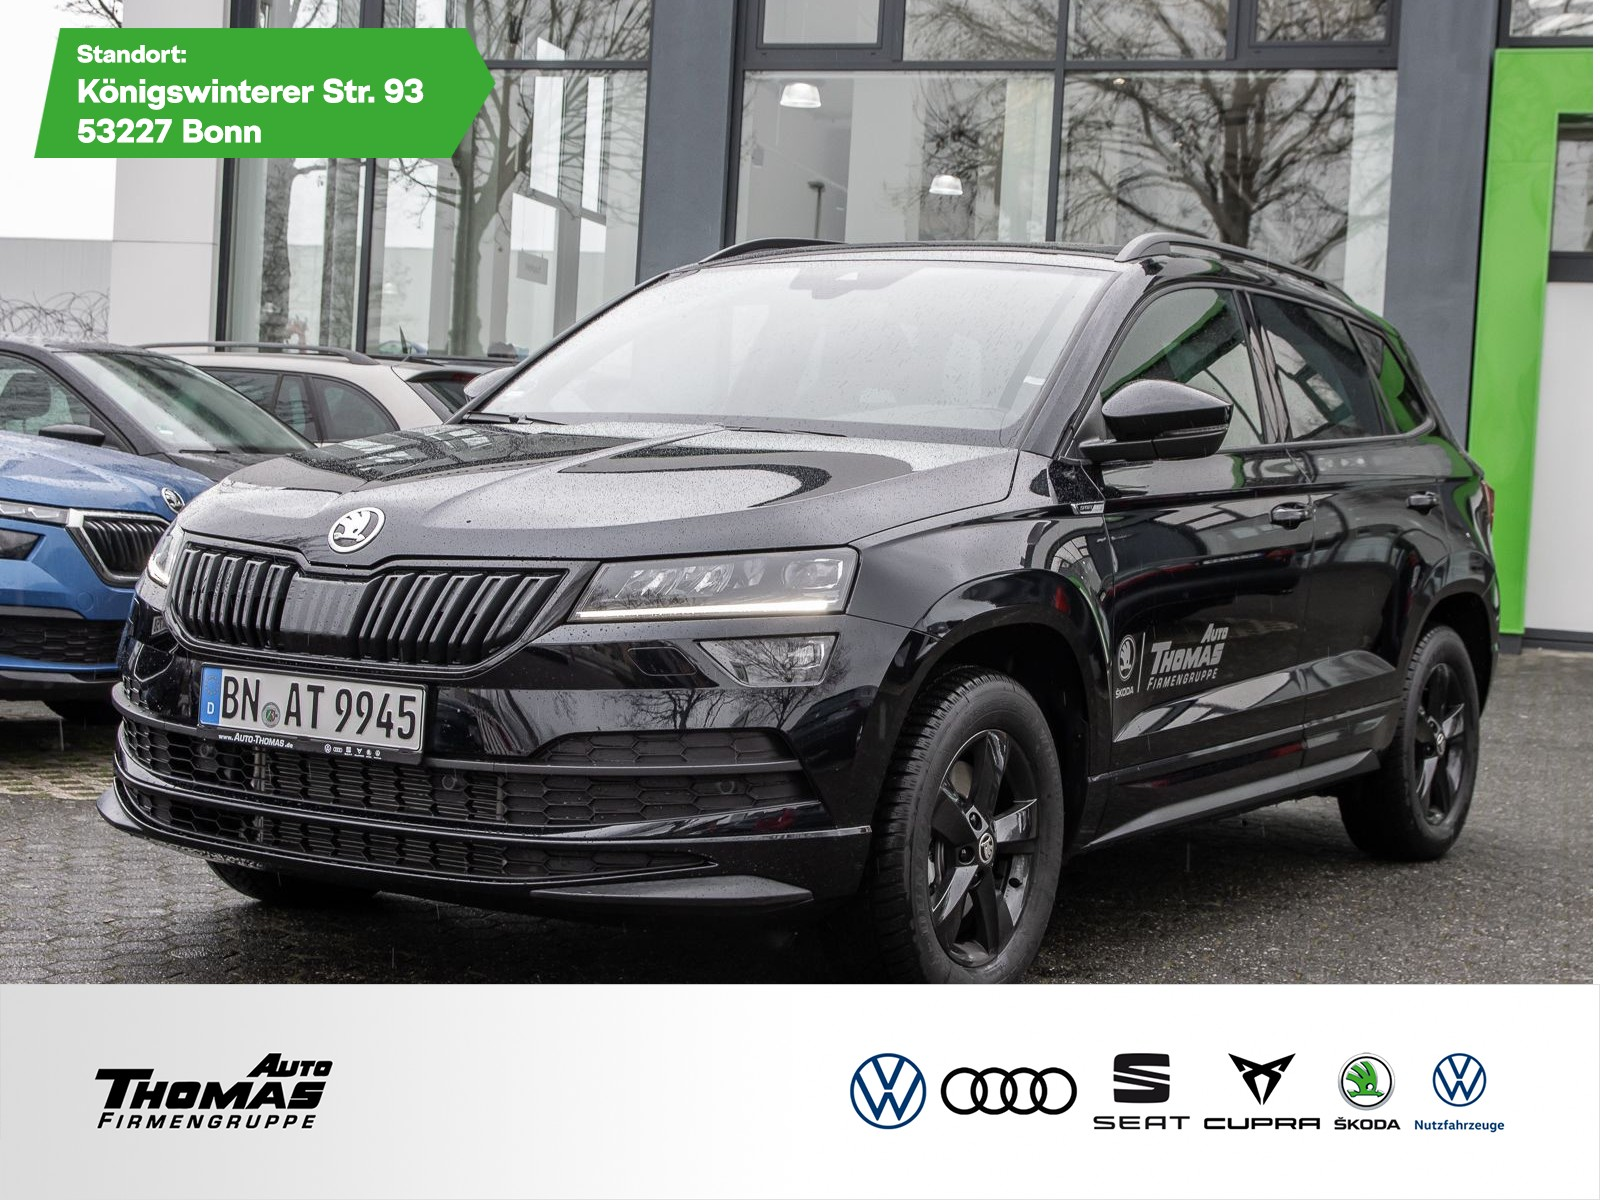 Skoda Karoq Sportline 2.0 TDI DSG 4x4 *ACC*AHK*NAVI*, Jahr 2020, Diesel